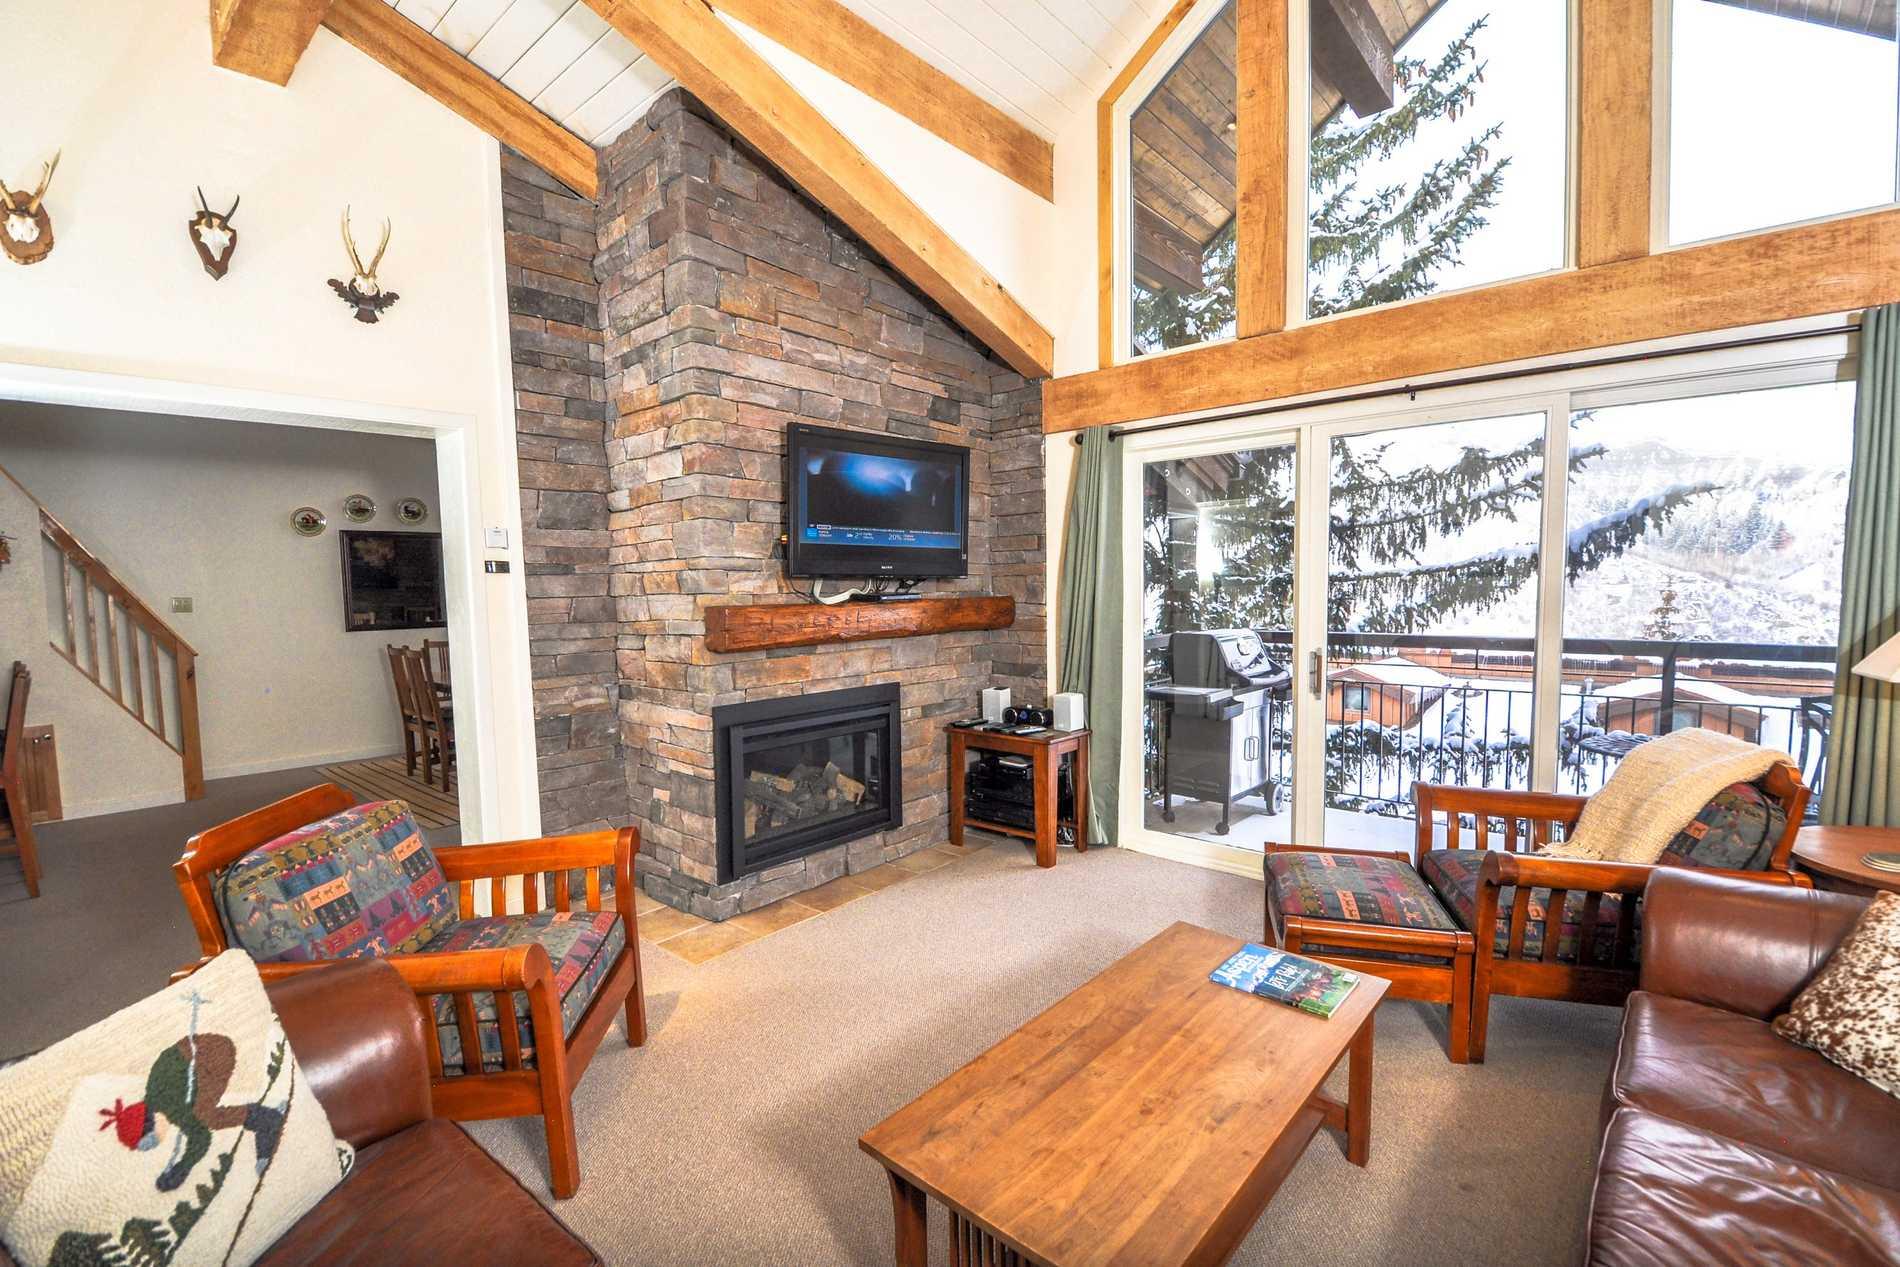 400 Wood Road, Unit 3307 Snowmass Village Photo 1